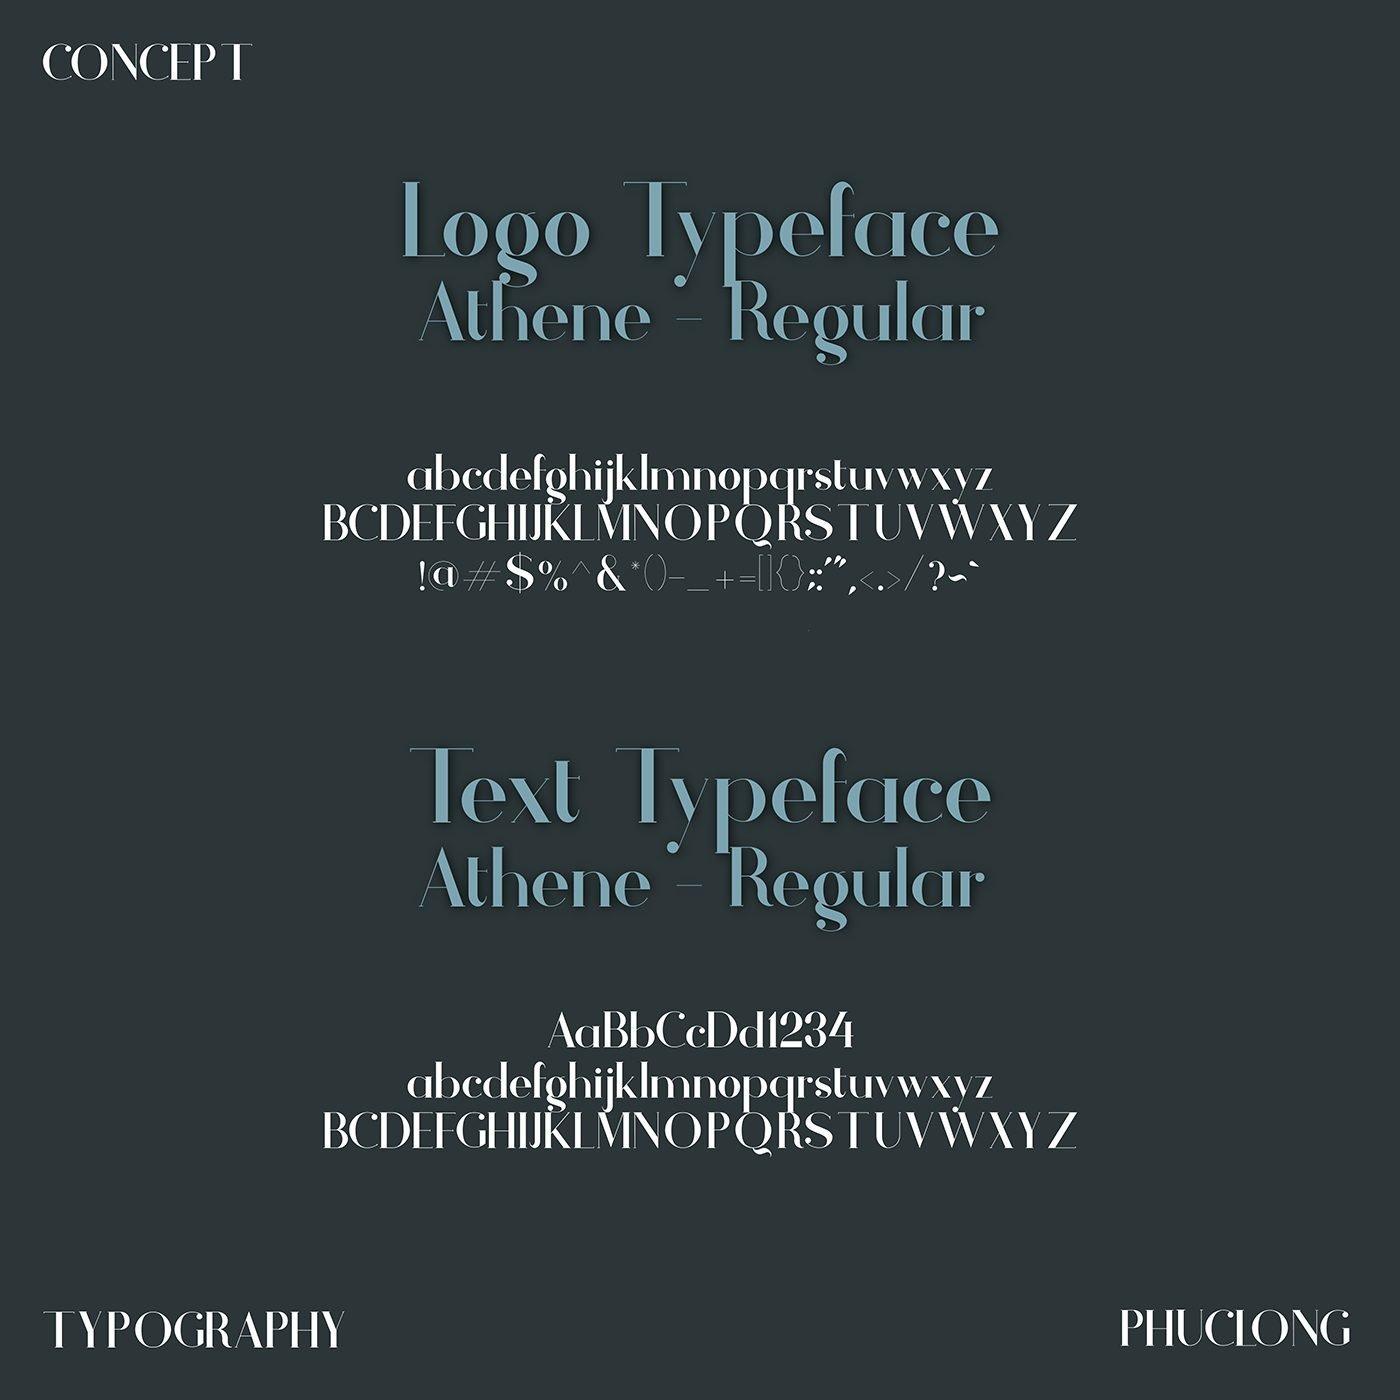 typography brand identity design branding logo design in saigon visual identities in ho chi minh corporate logo logo graphic design and branding web design in Saigon by Helixgram